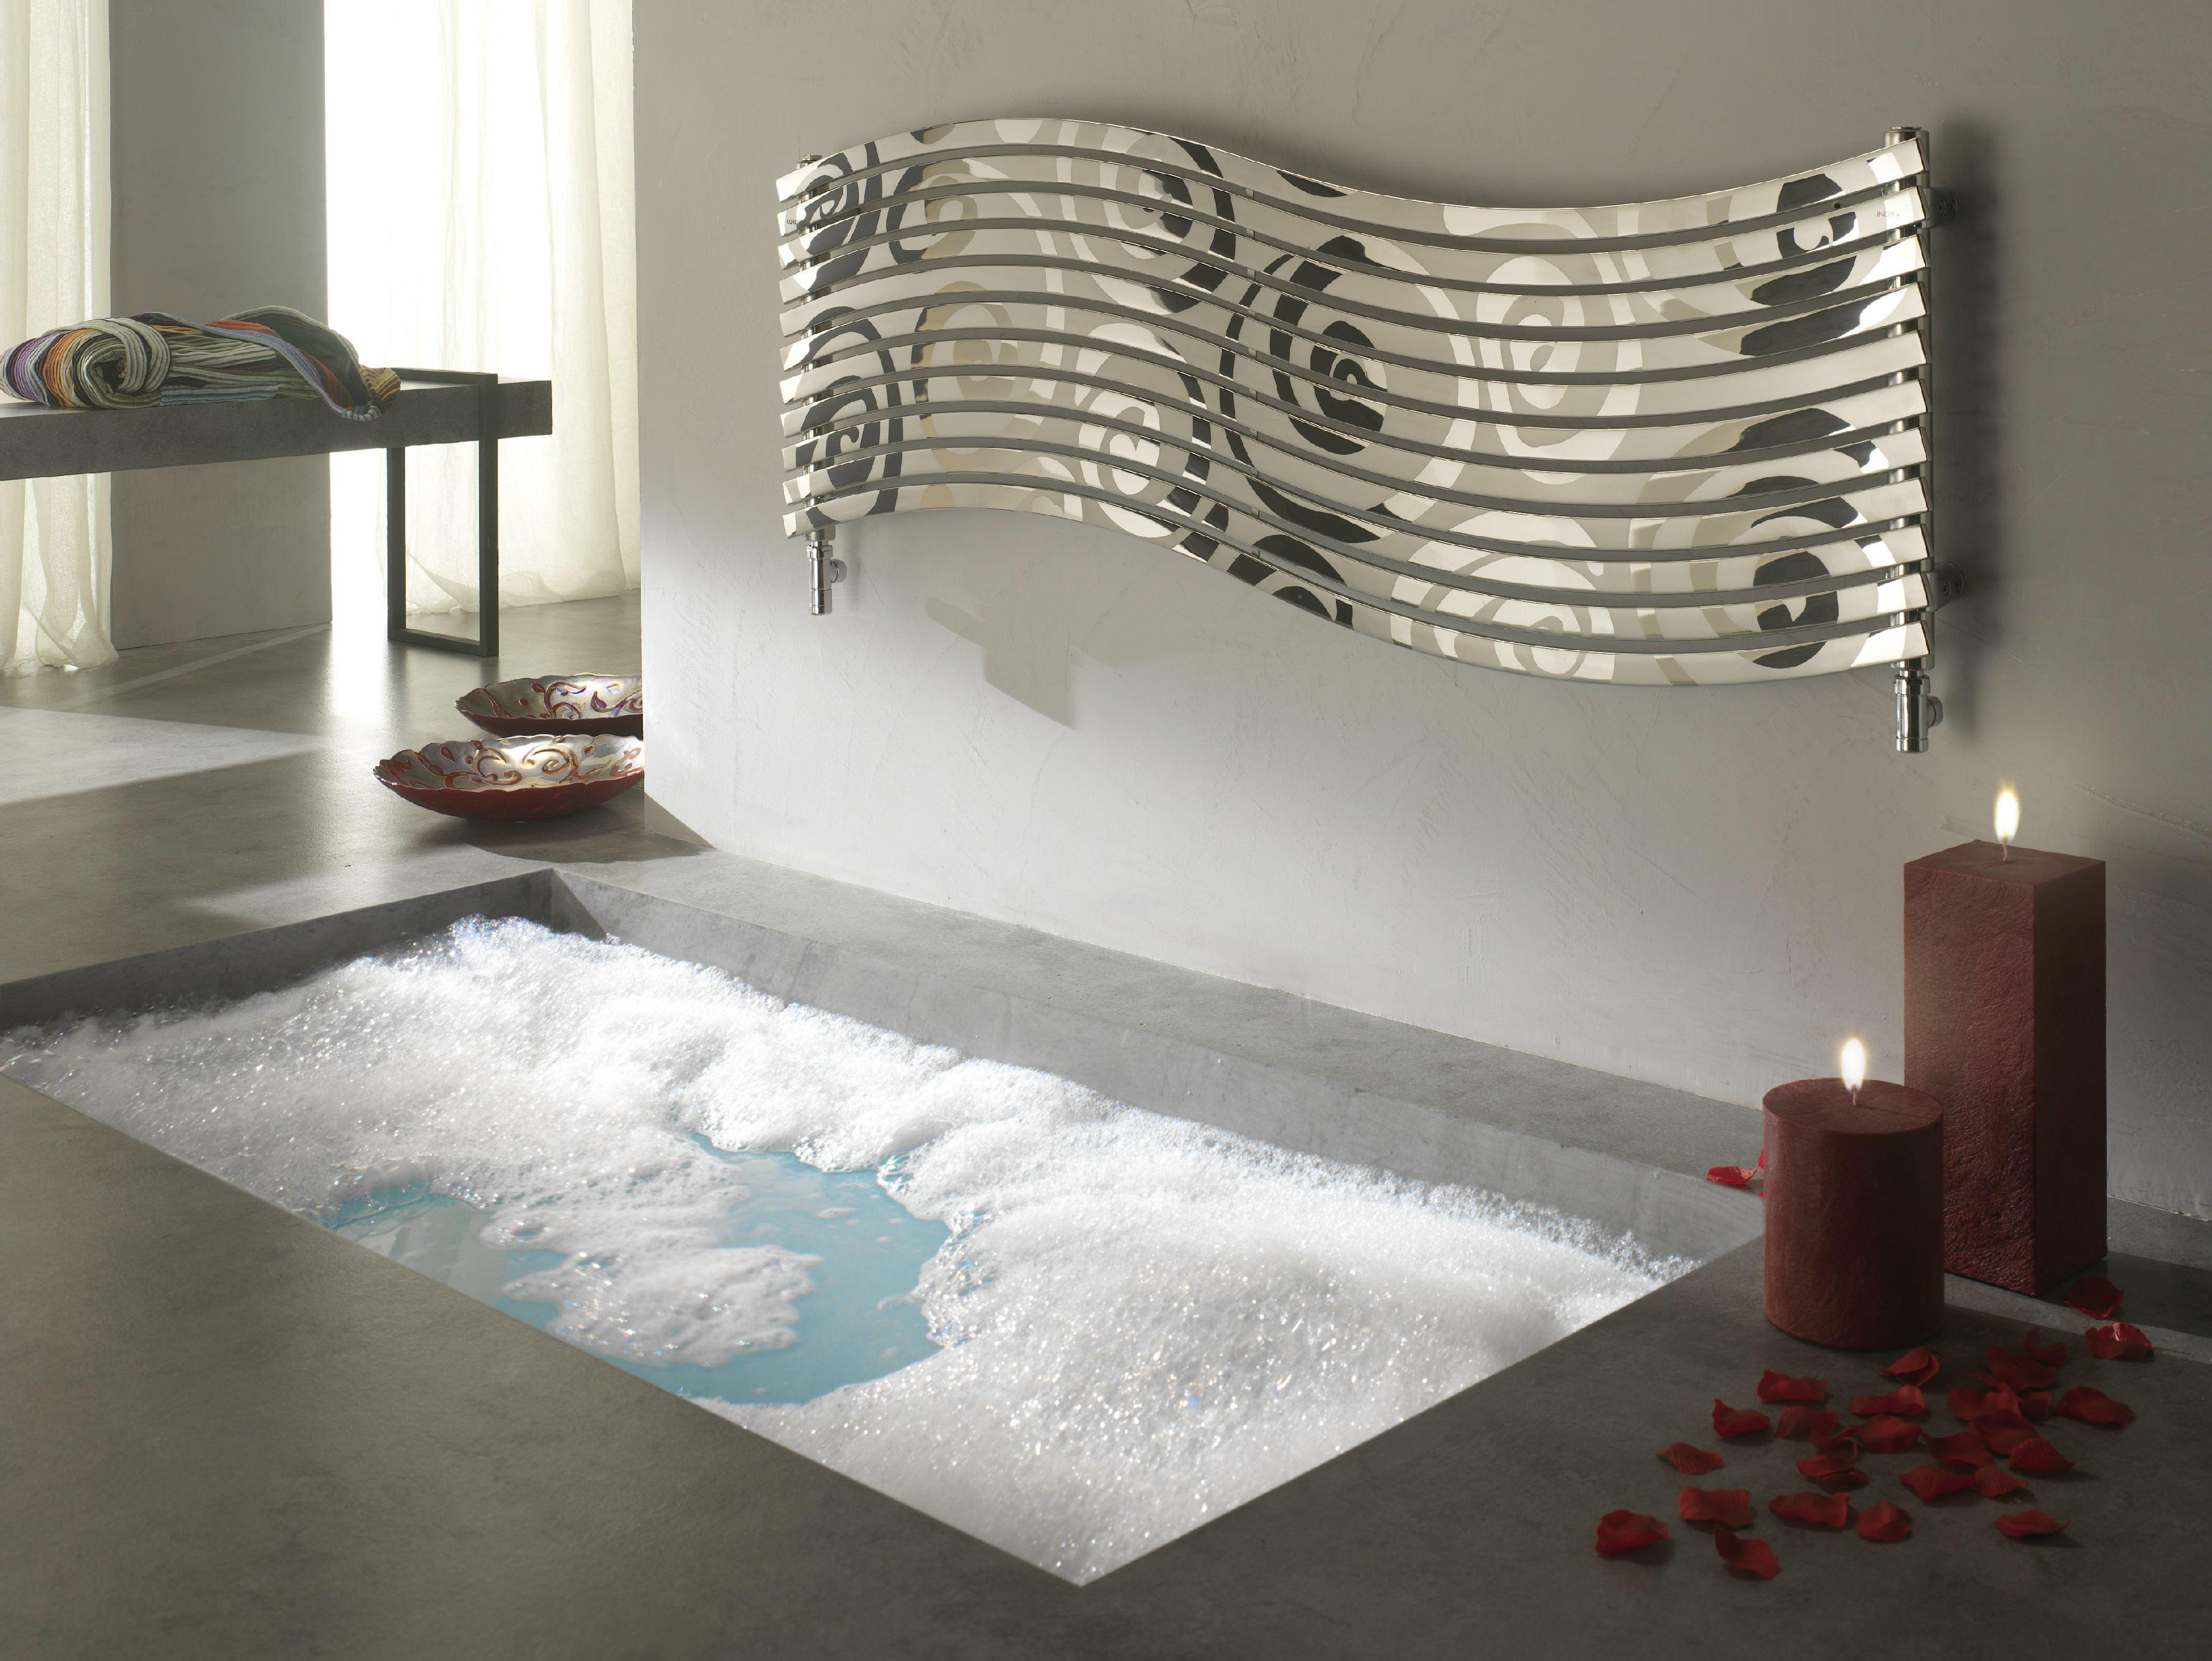 warmwasser designheizk rper aus edelstahl lola decor by cordivari design mariano moroni. Black Bedroom Furniture Sets. Home Design Ideas